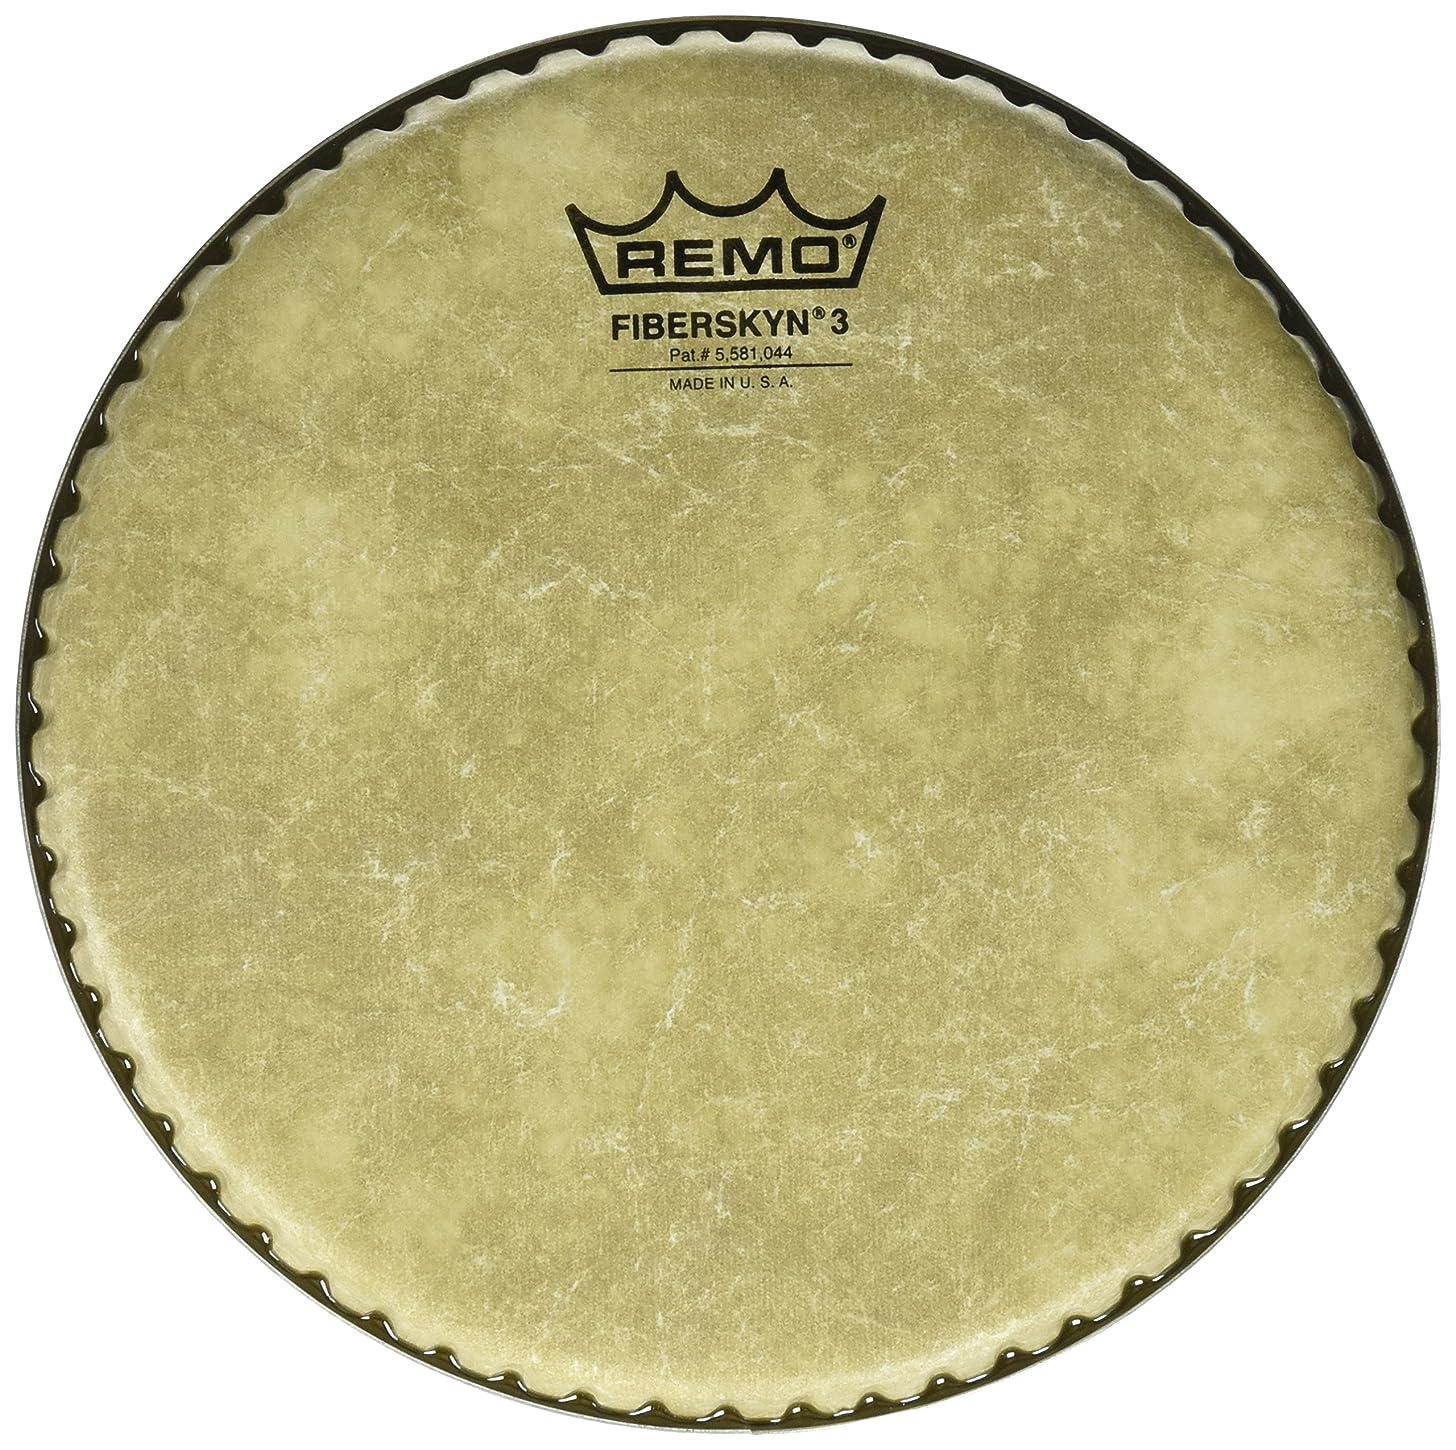 Remo M6-S800-F3 8-Inch S-Series Fiberskyn Bongo Drumhead